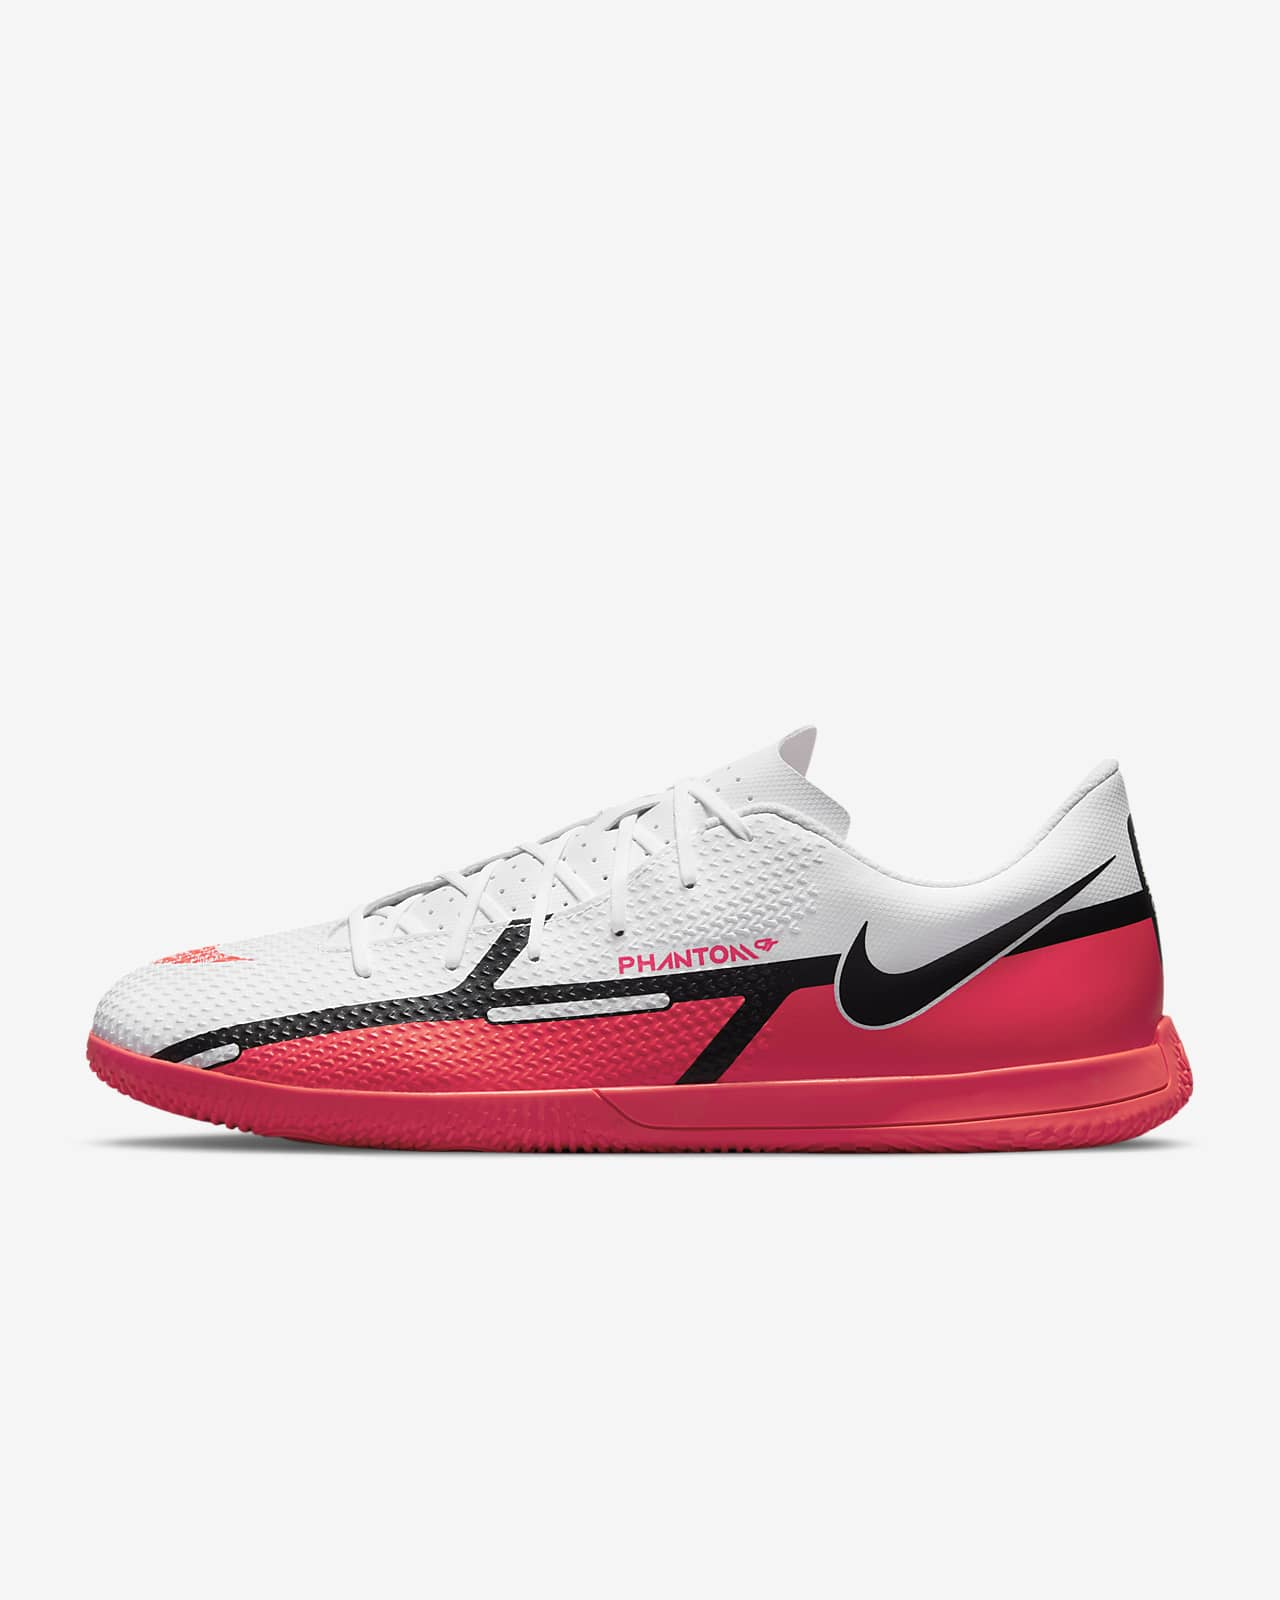 Nike Phantom GT2 Club IC Indoor Court Football Shoe